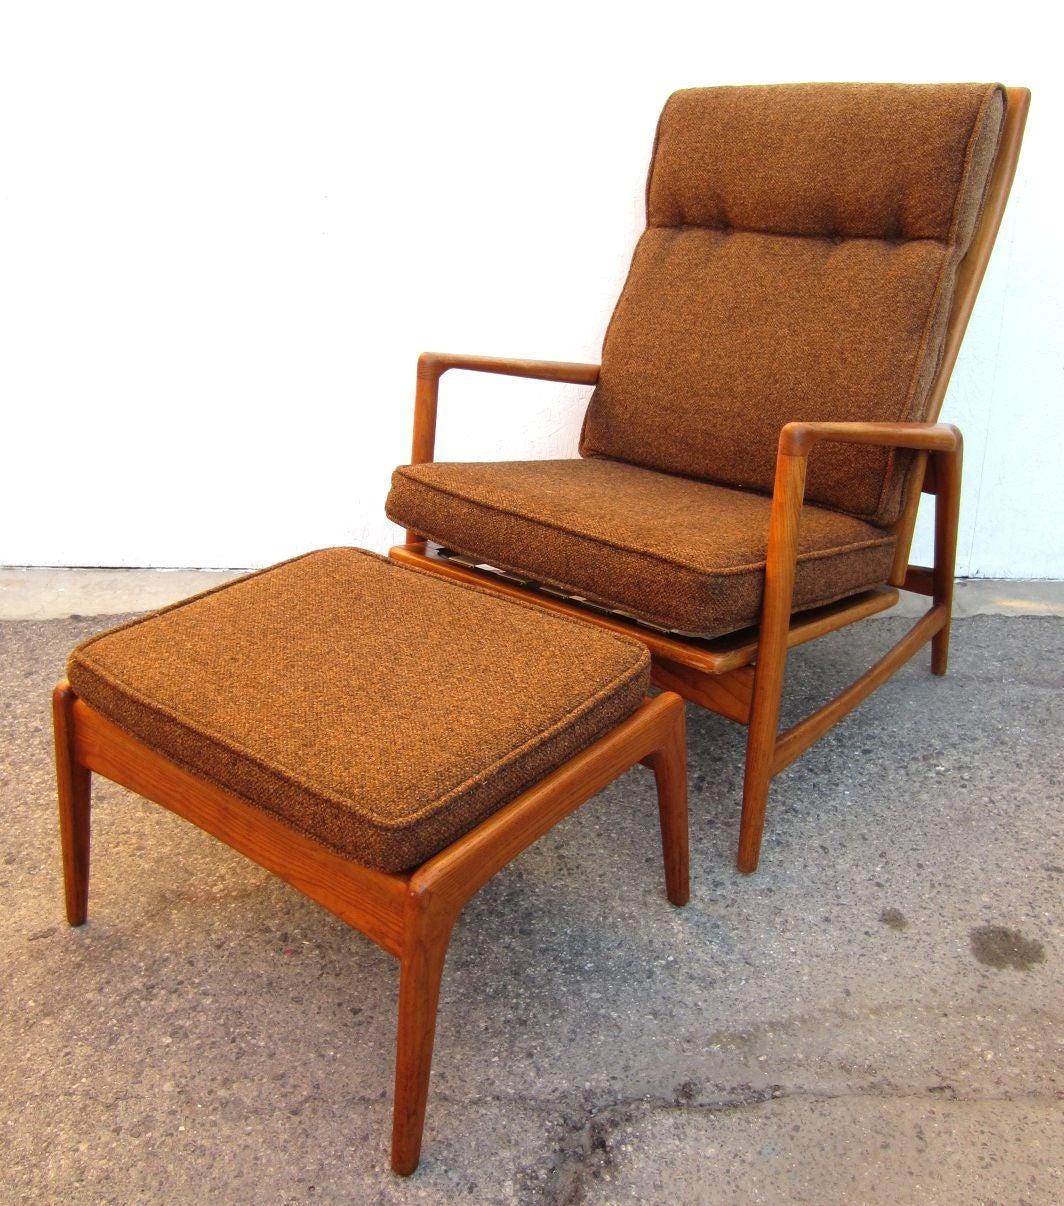 1950 danish mid century modern lounge chair and ottoman ib kofod larsen at 1stdibs - Mid century modern chair and ottoman ...